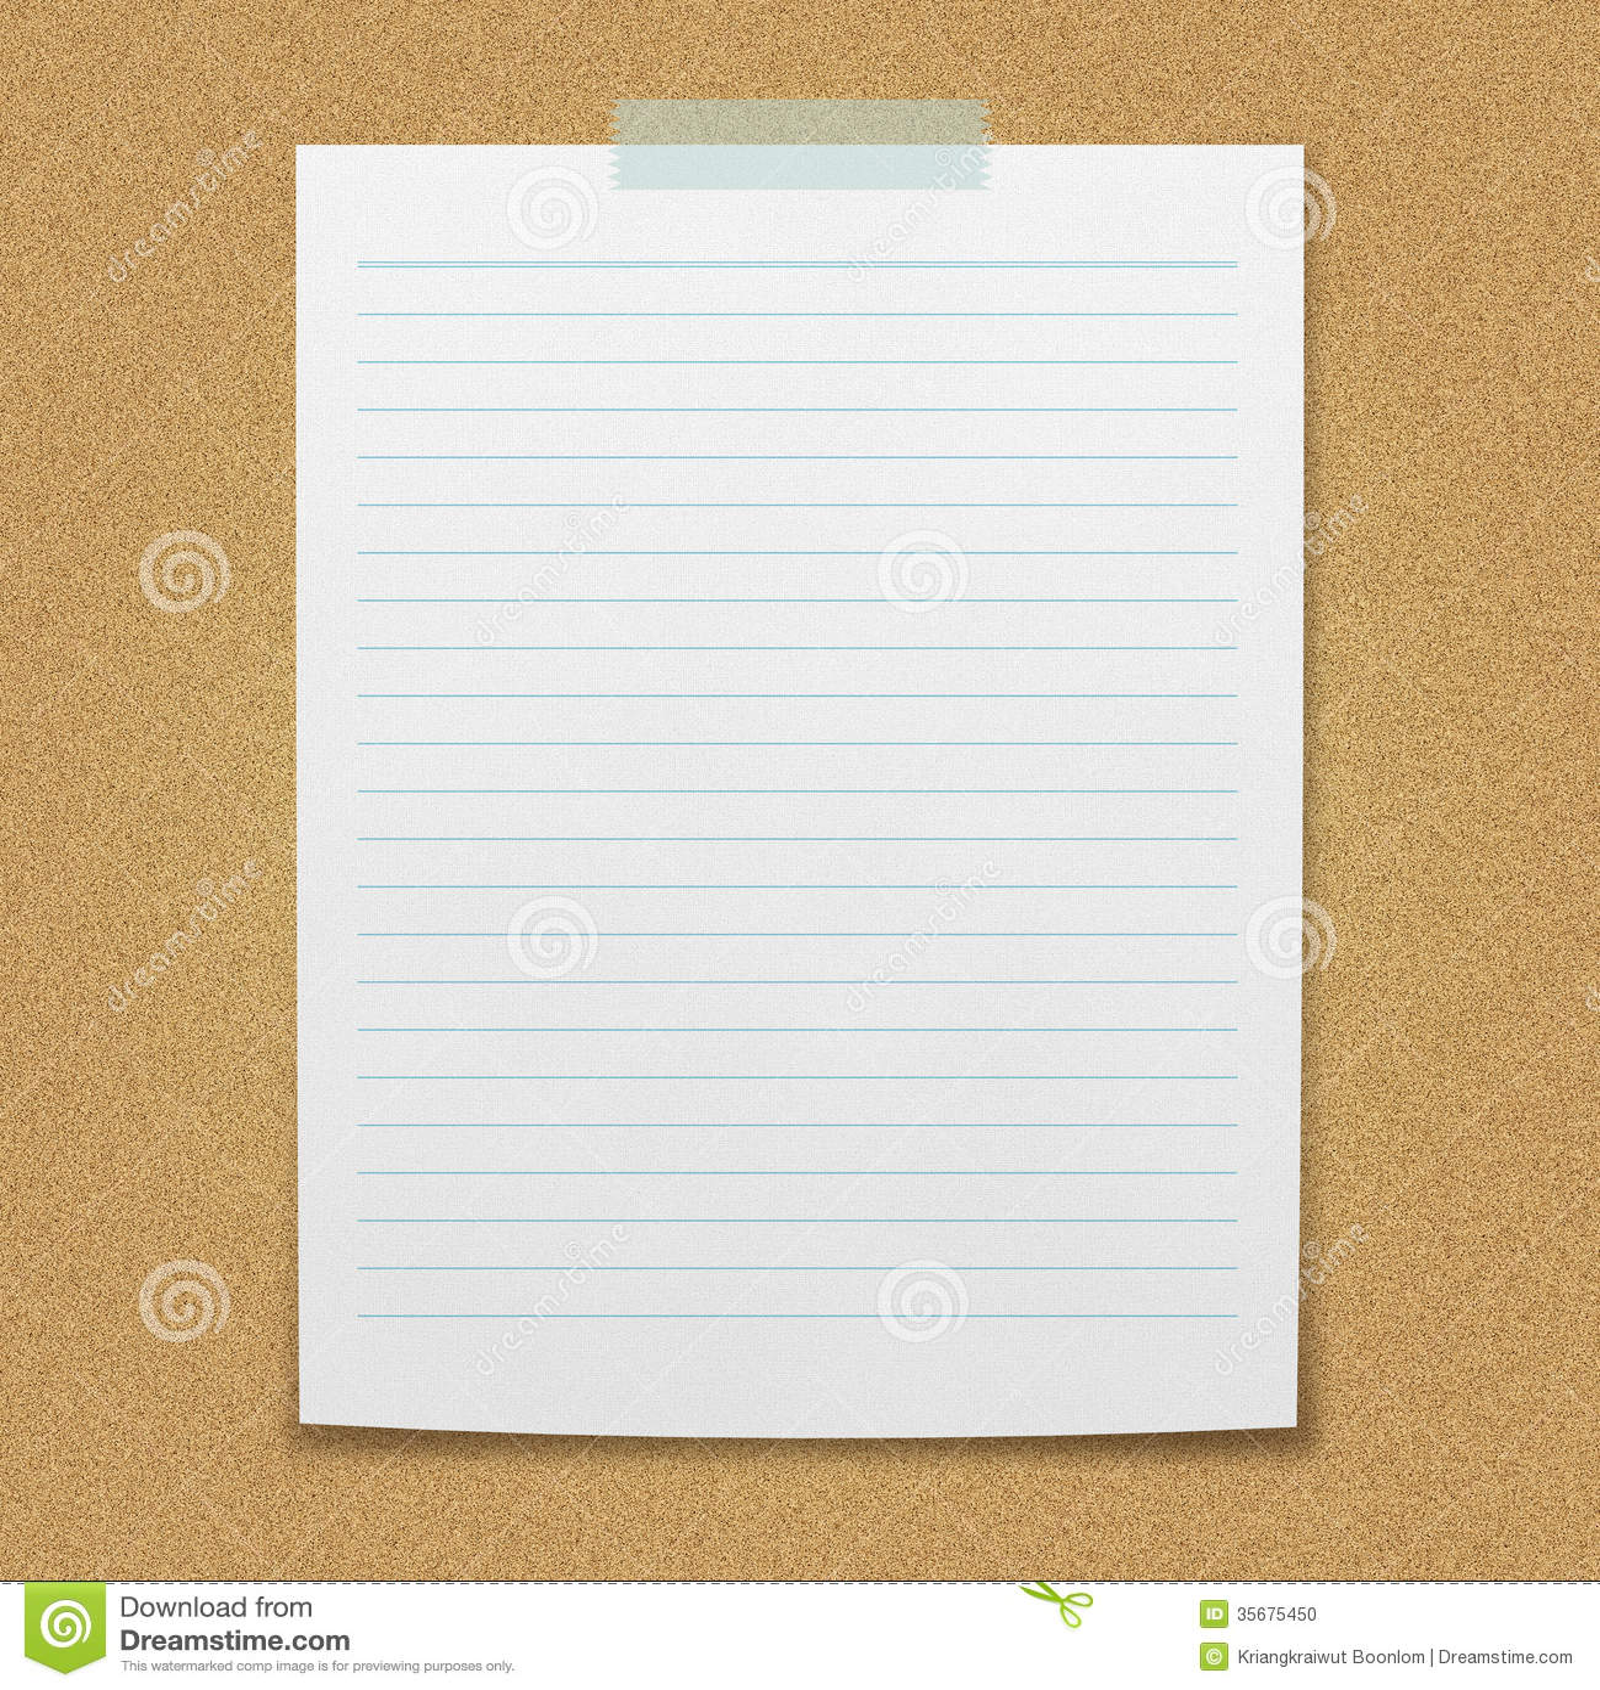 Lined paper sheet. stock illustration. Illustration of design - 35675450